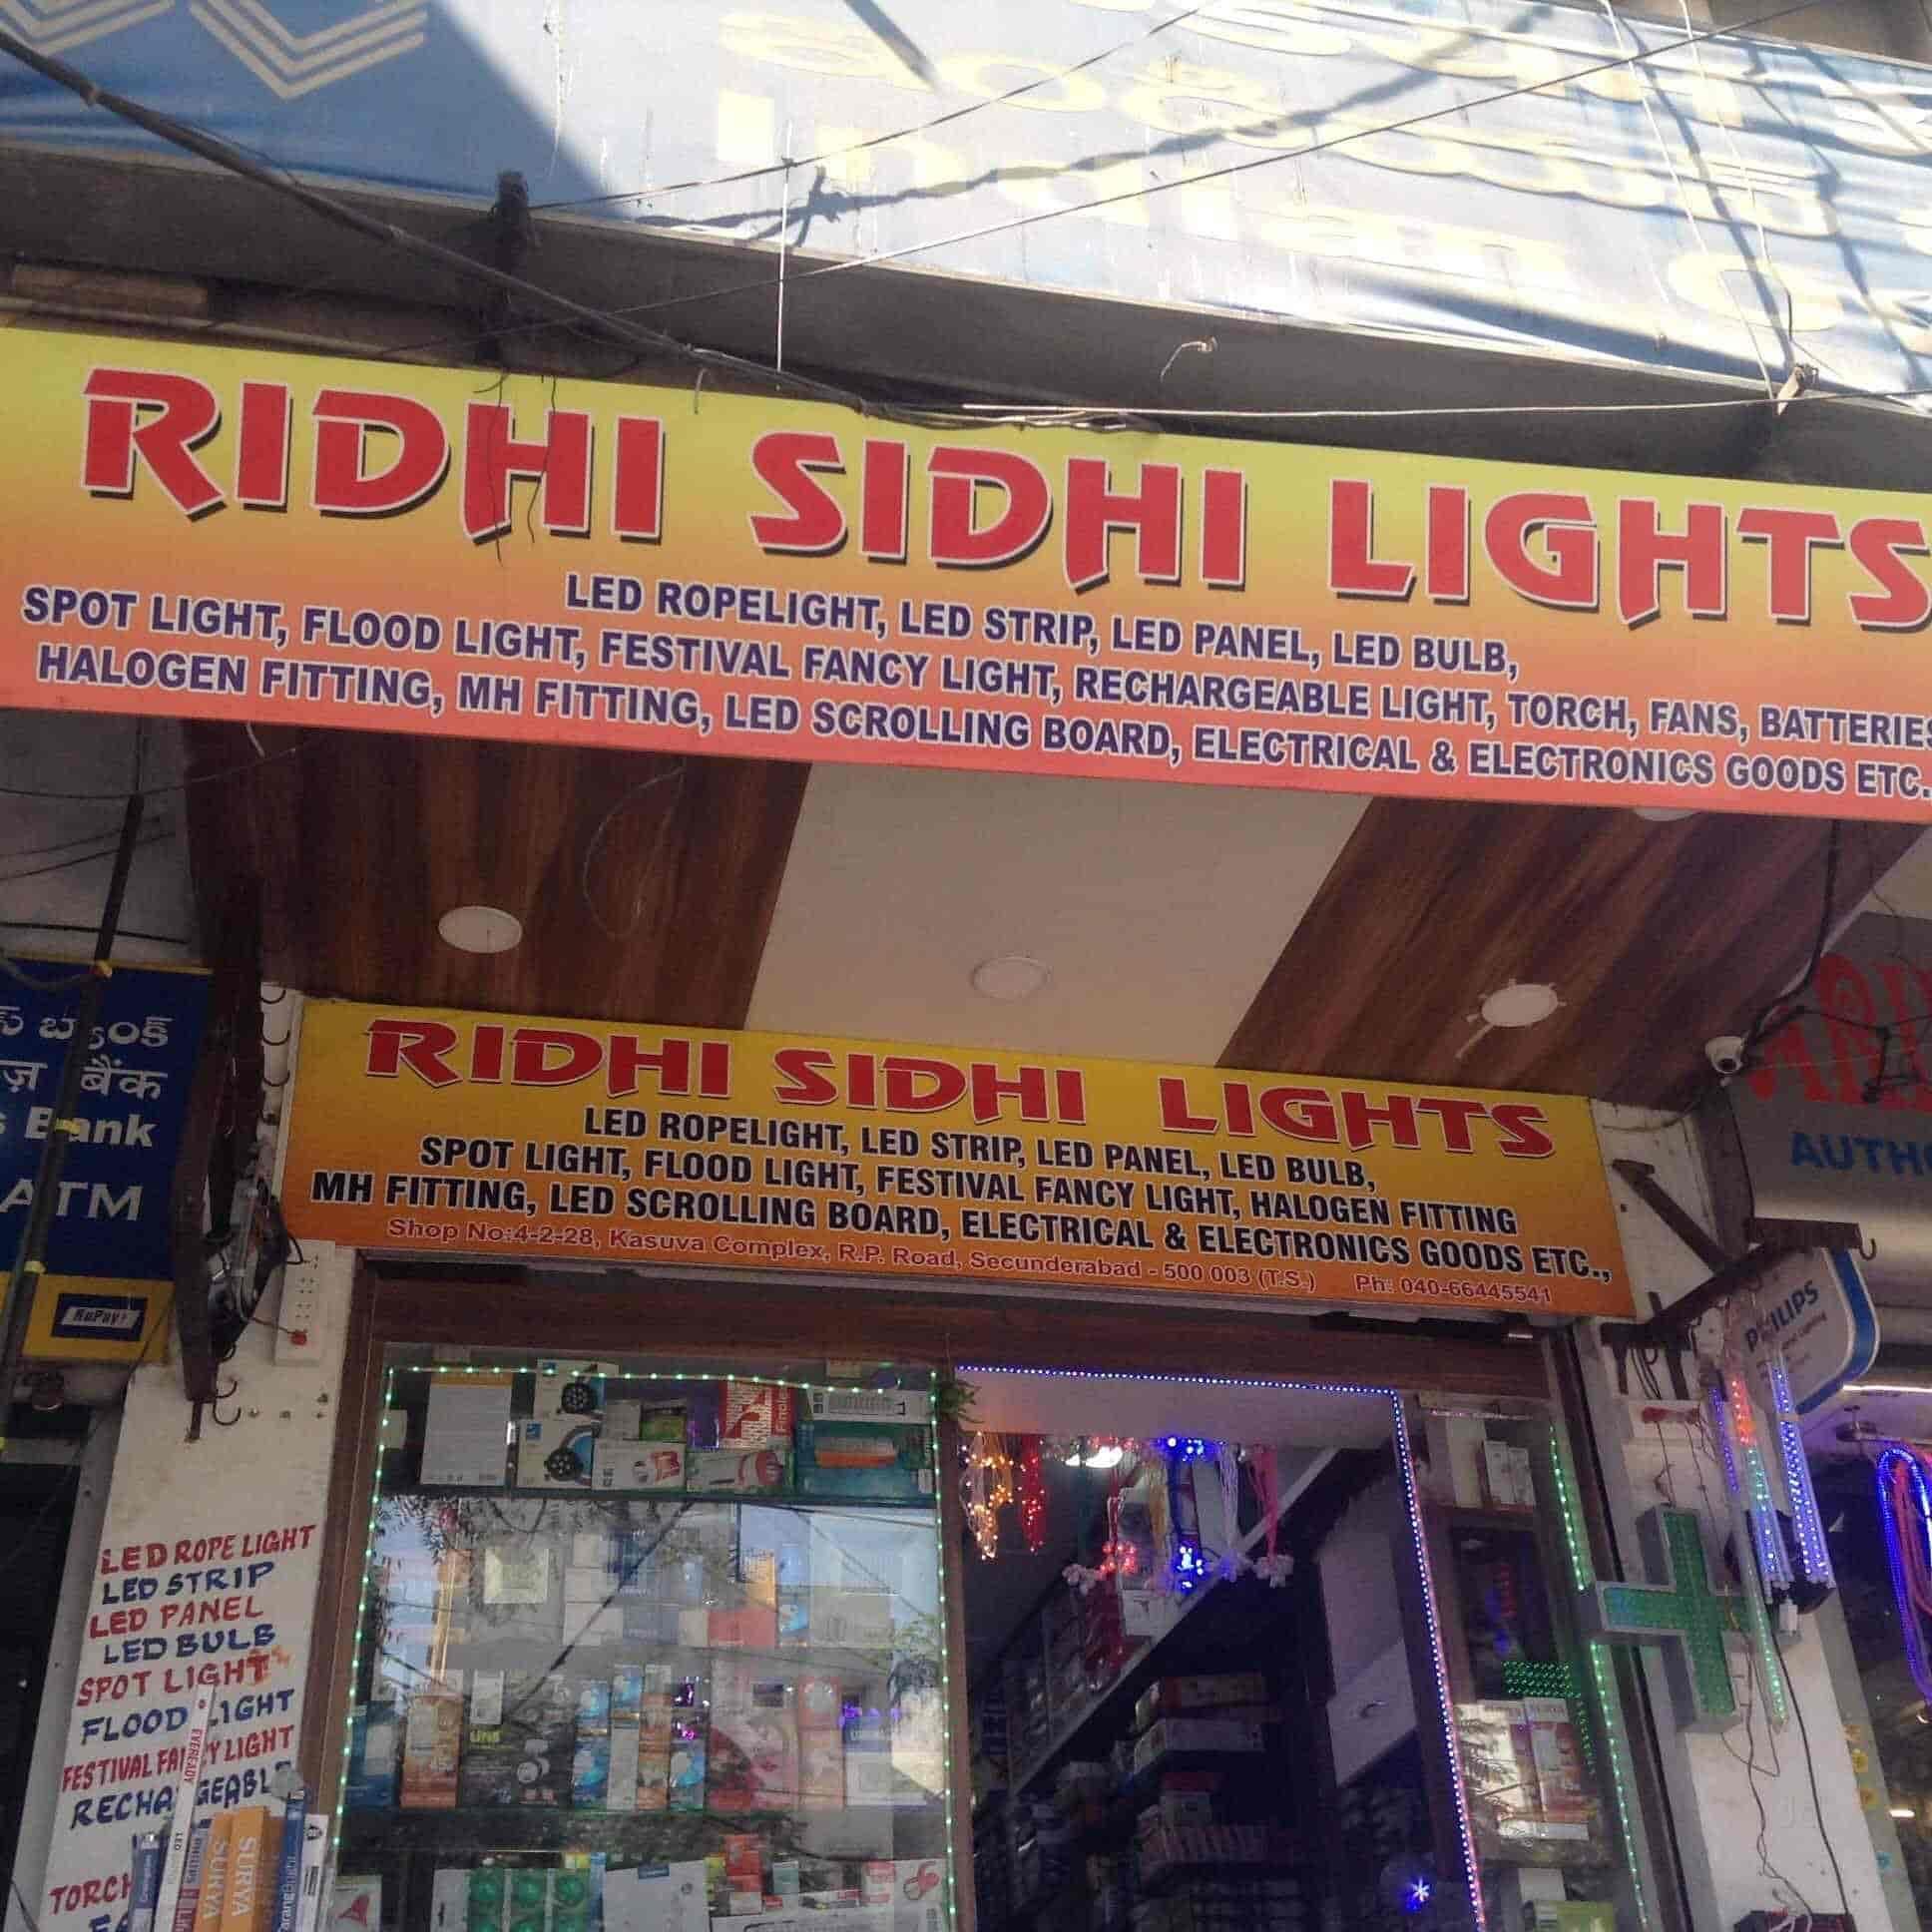 Ridhi Sidhi Lights, Secunderabad - LED Light Dealers in Hyderabad